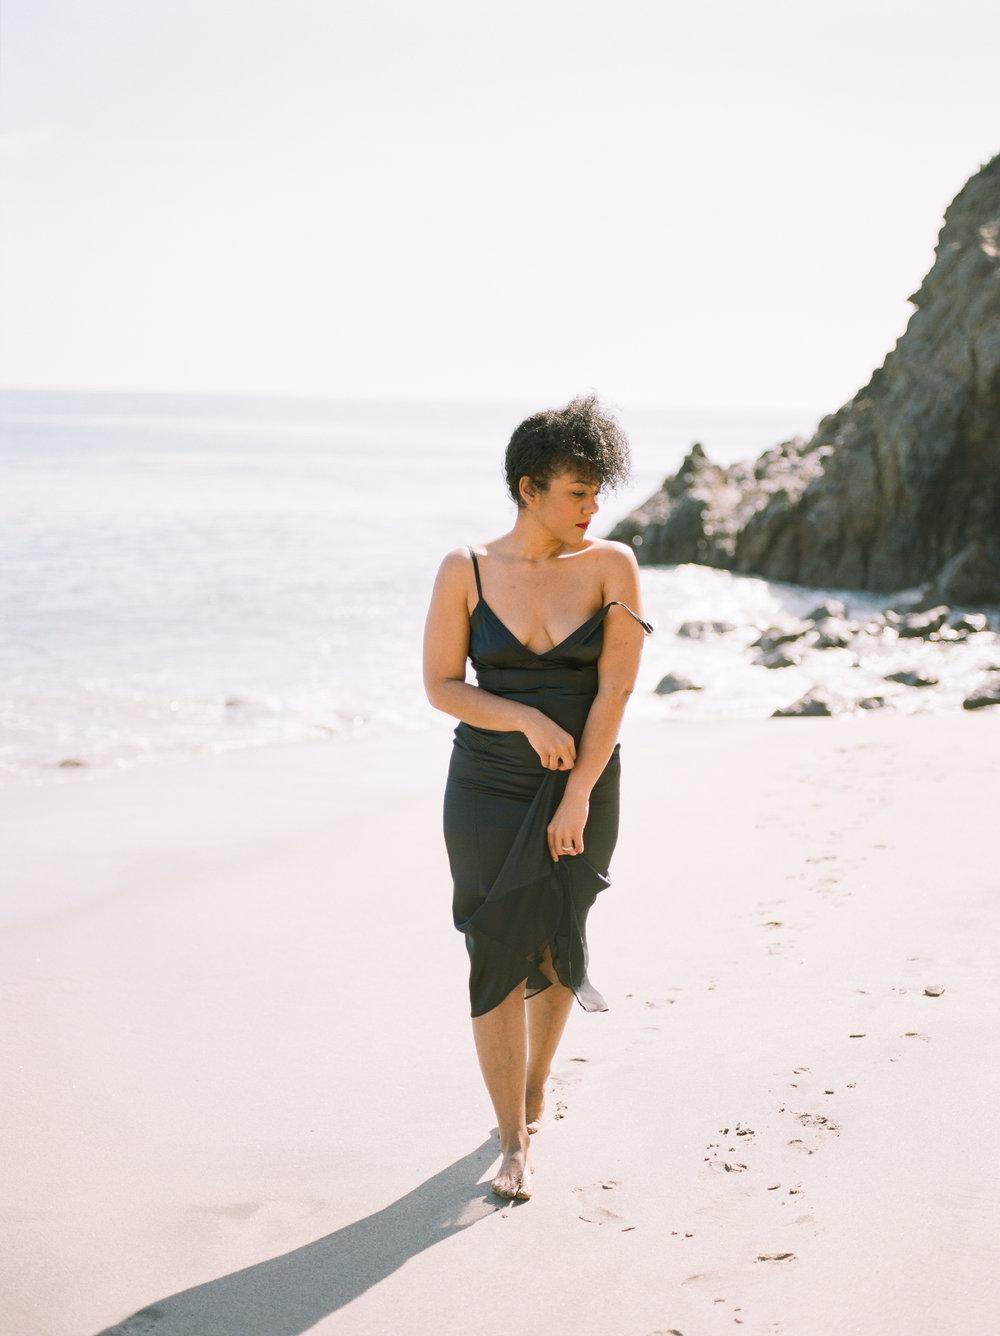 Malibu LA Beach Photographer Film Photographer West Palm Beach Photographer Denice Lachapelle-15.jpg